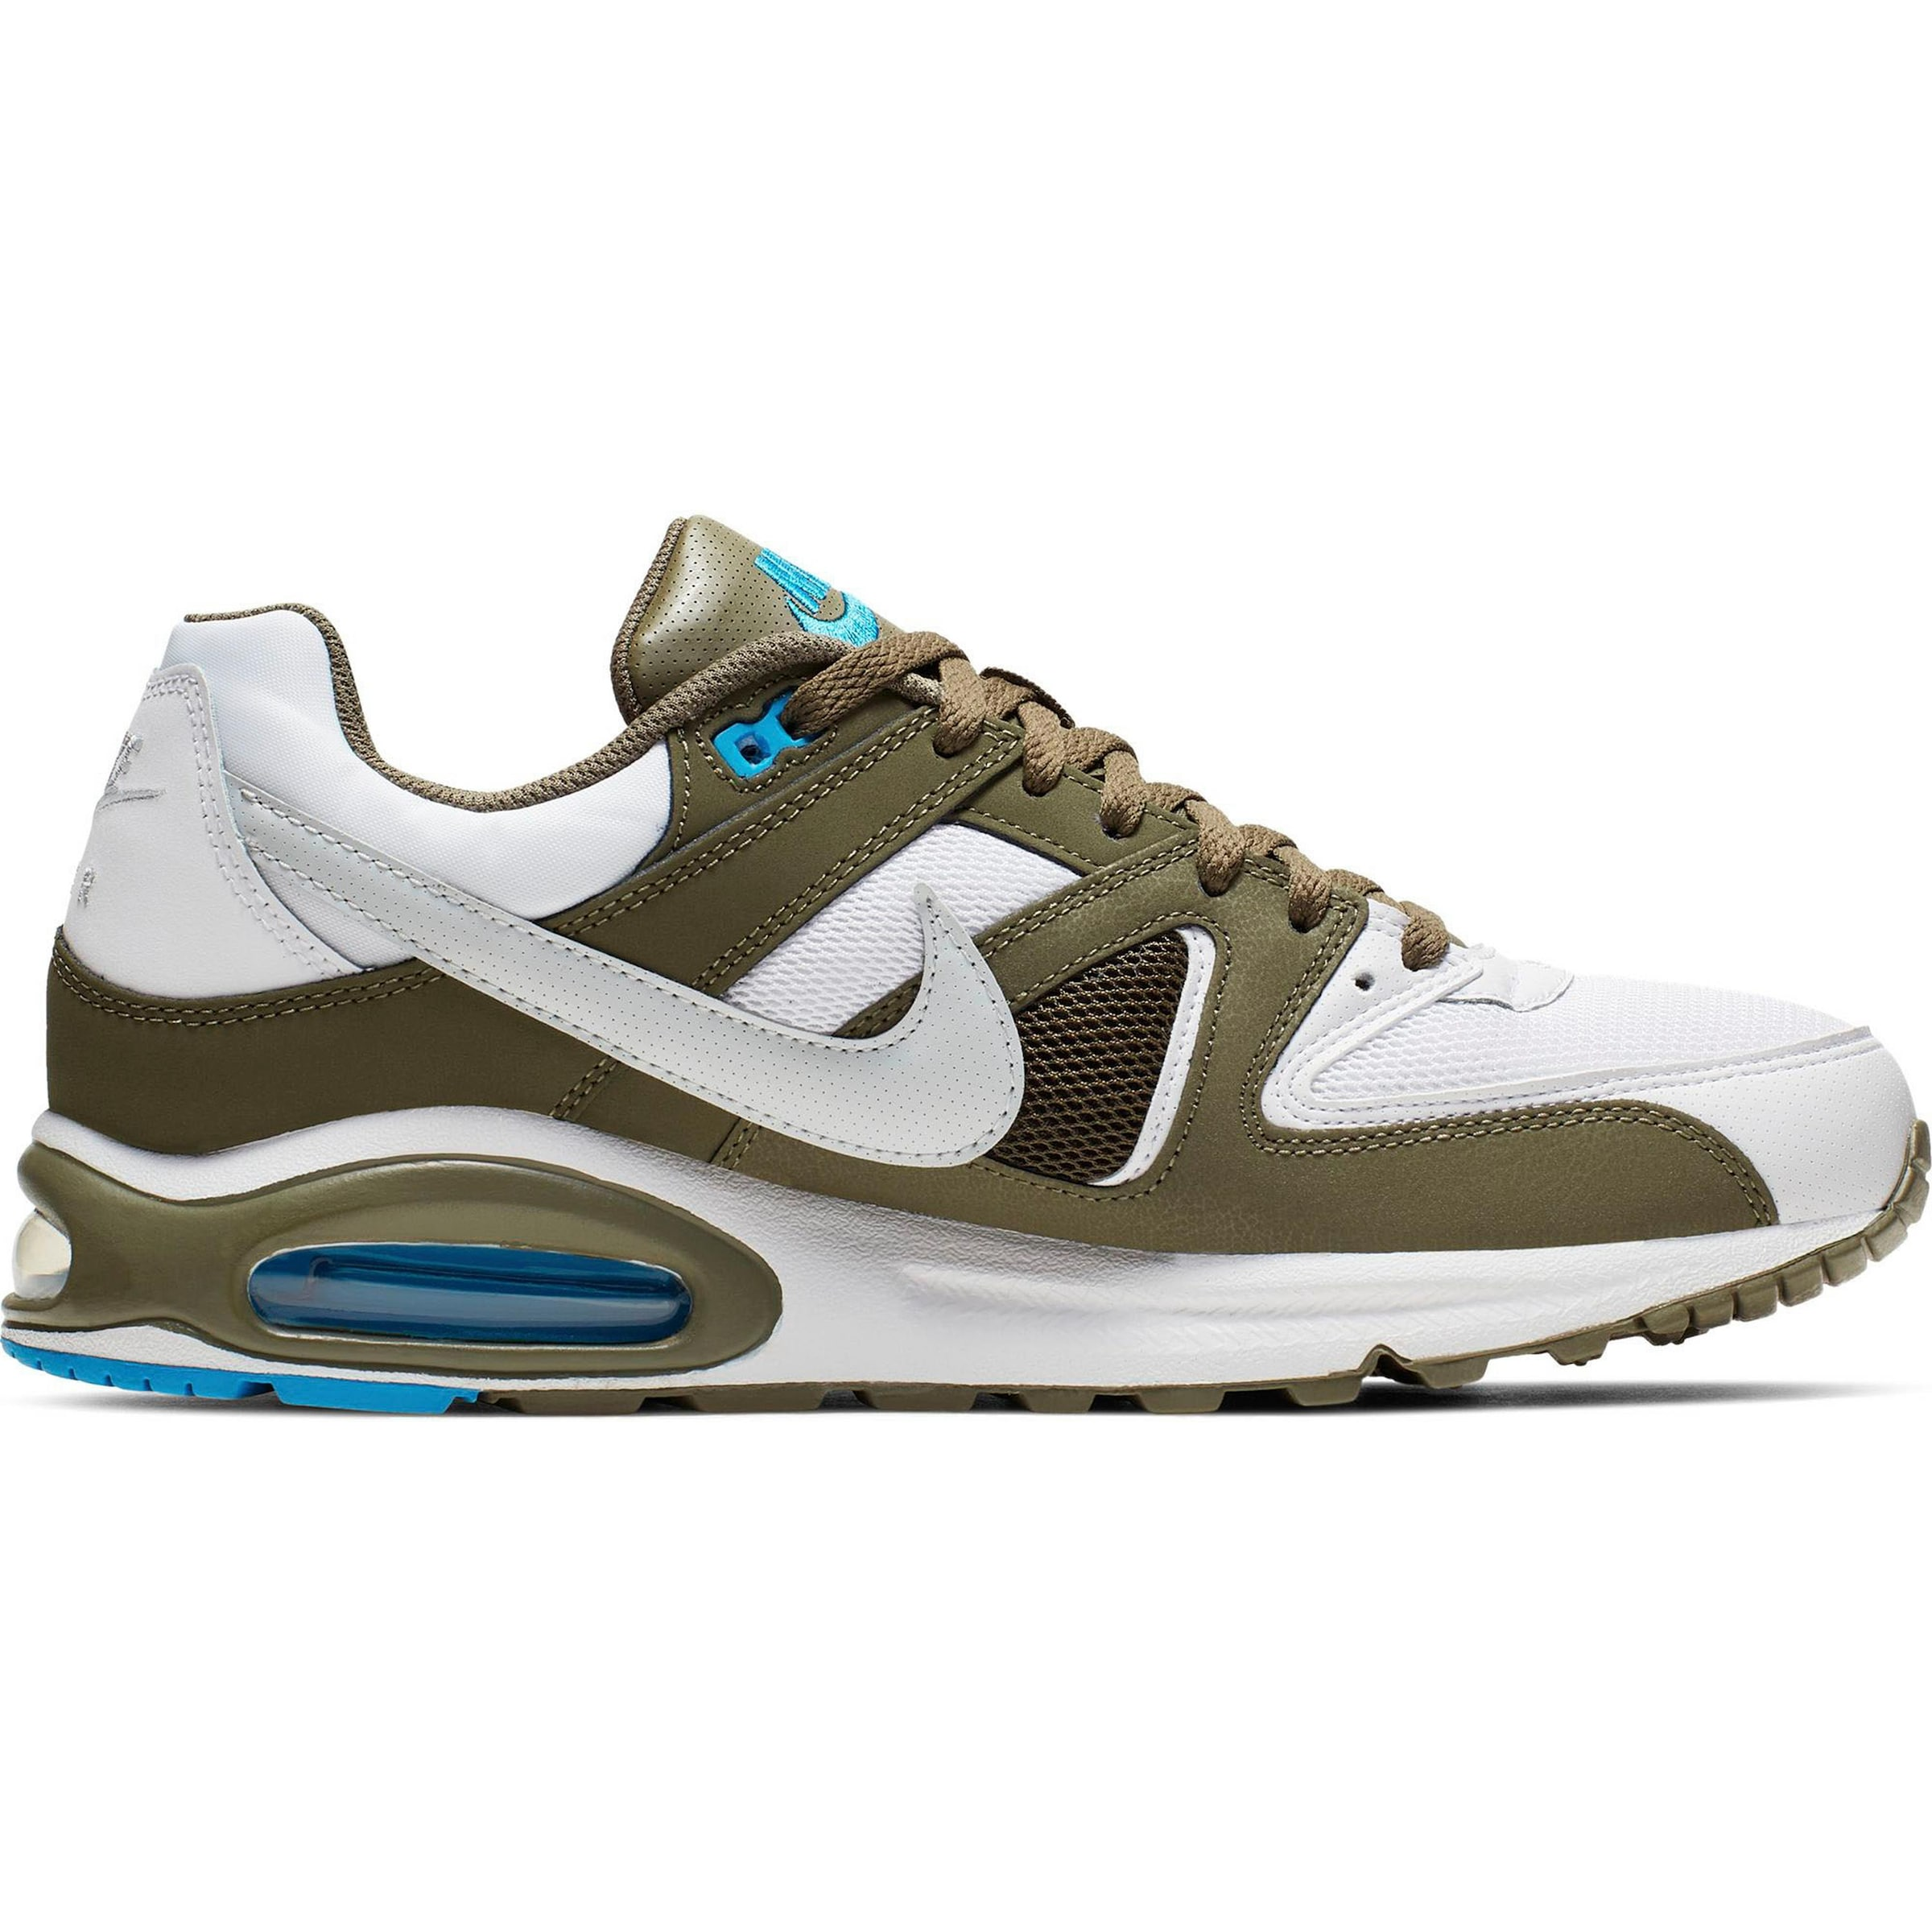 Sportswear In BraunWeiß Nike Sneaker Command' Max 'air Nn0X8wOkP